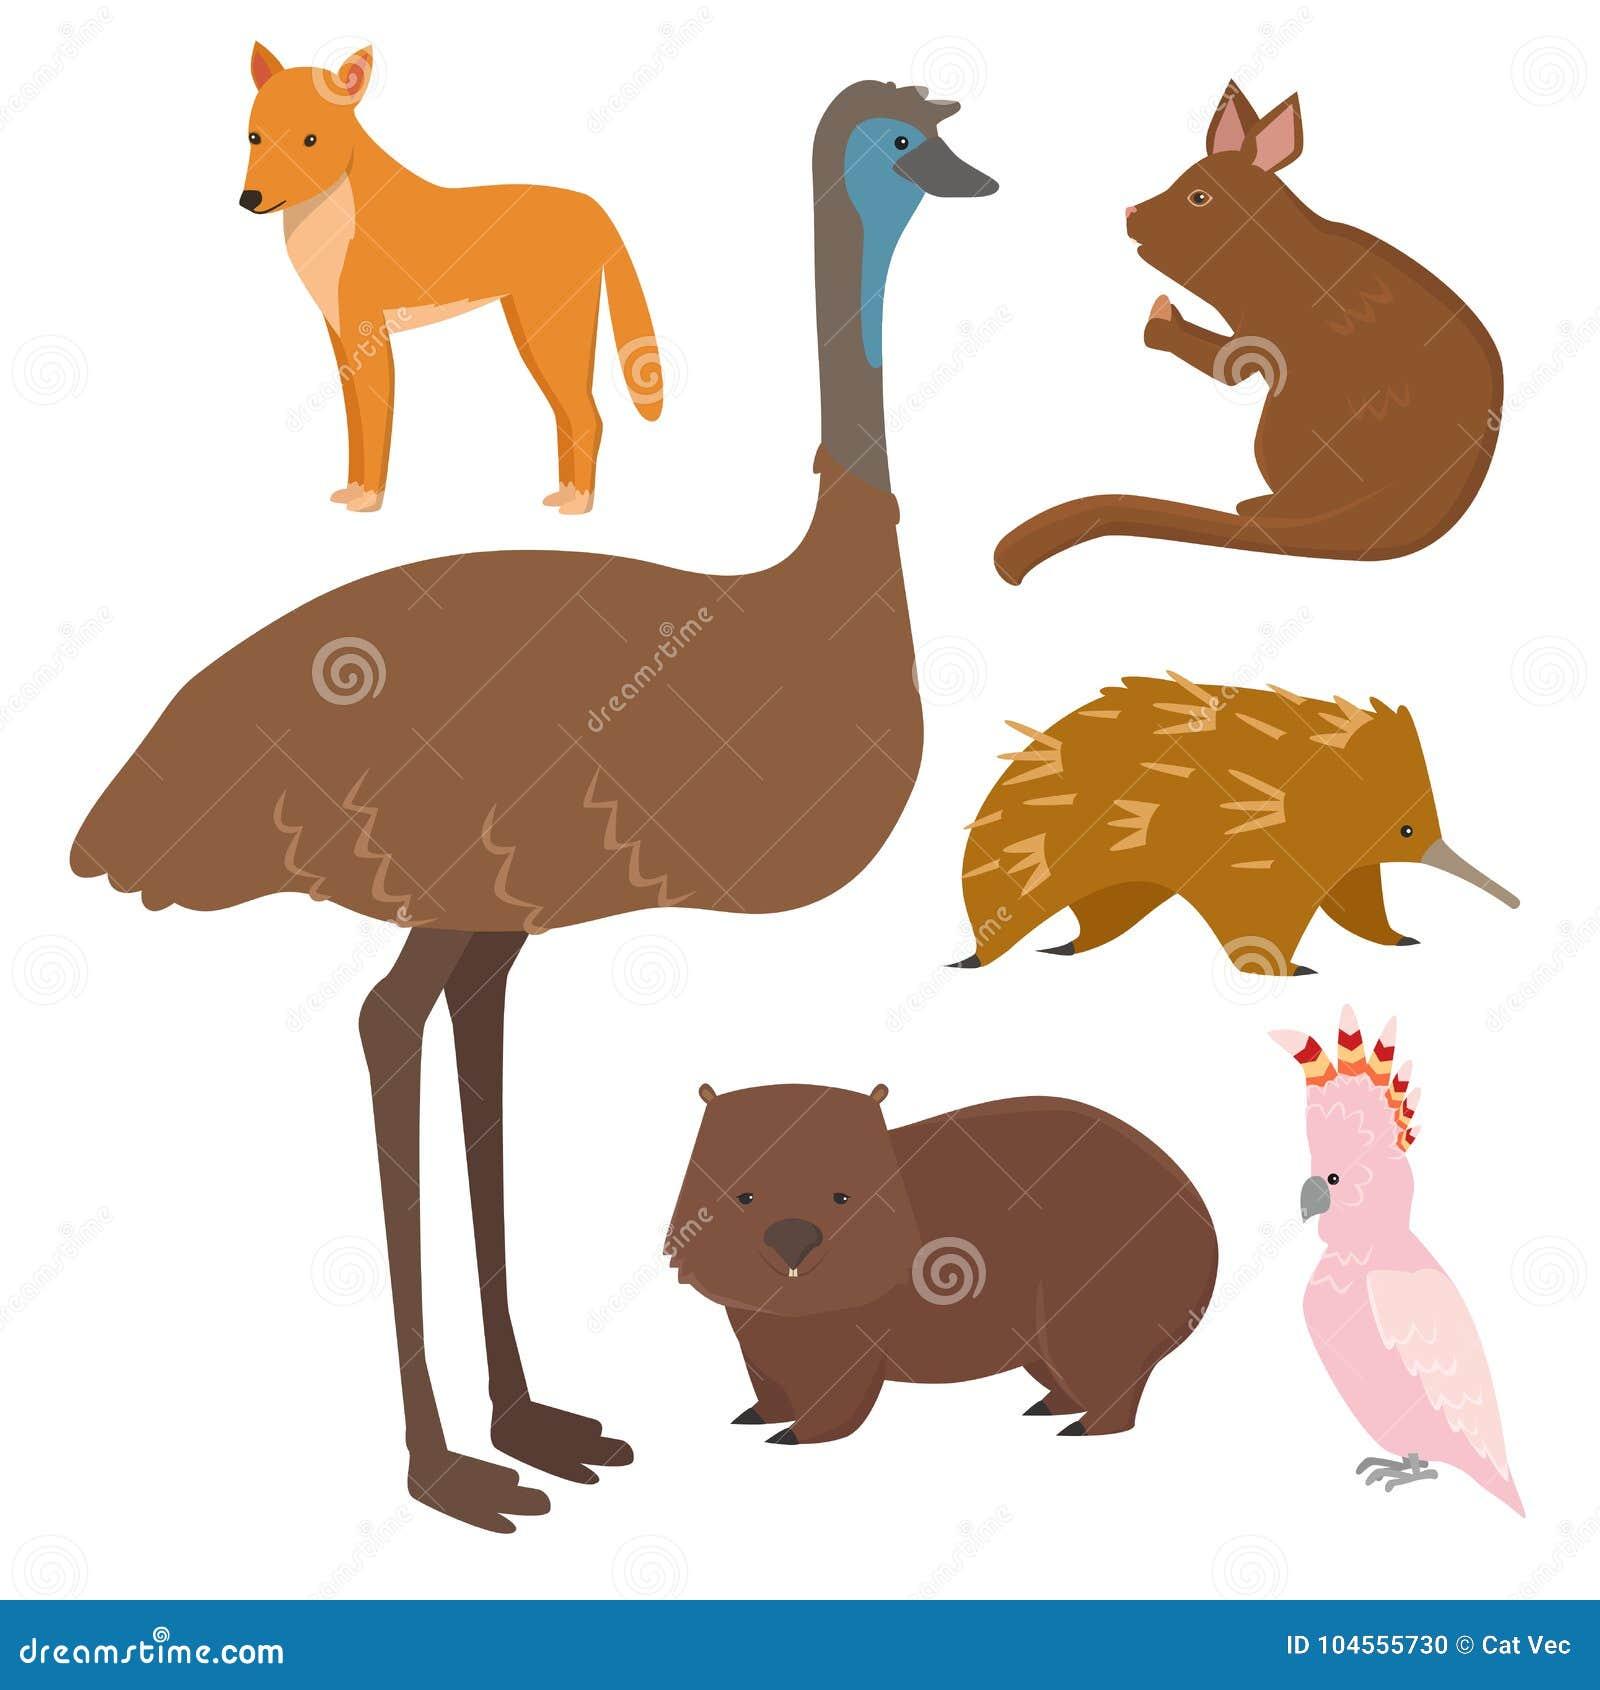 animal dreams characters